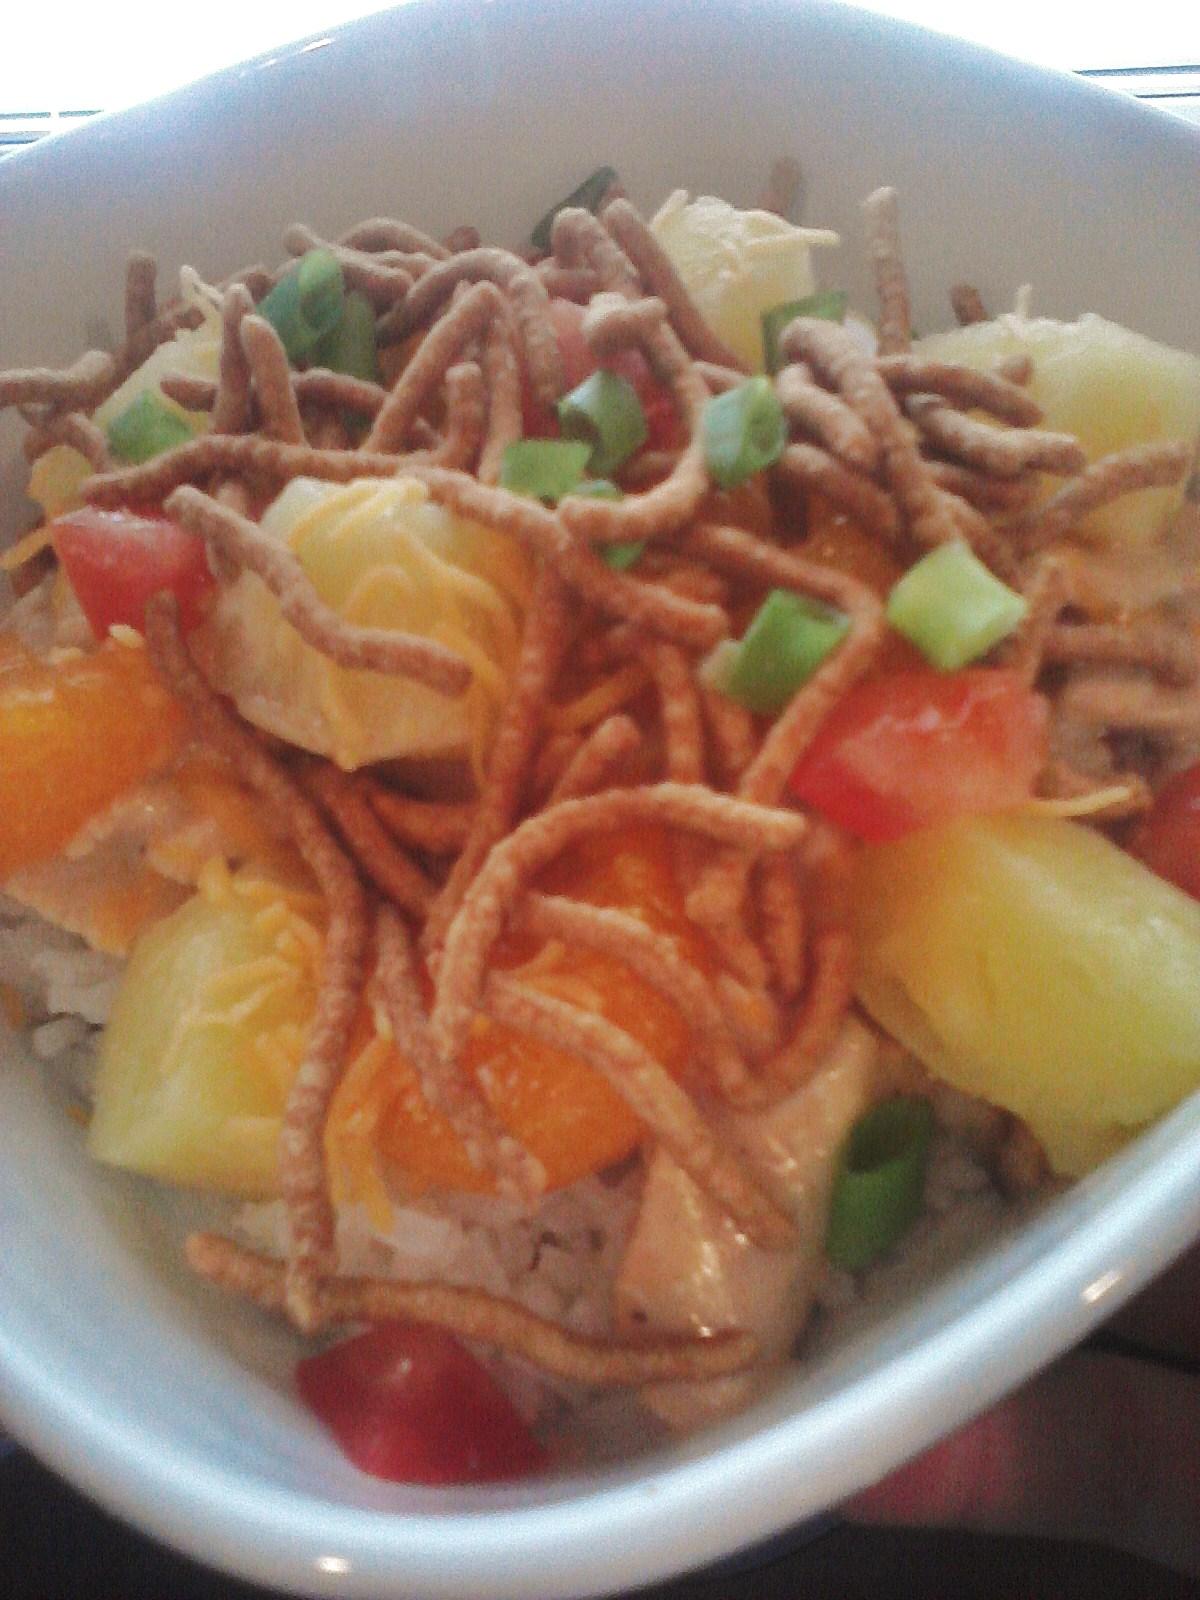 Britt's Apron: Hawaiian Haystacks w/ Homemade Chicken Sauce